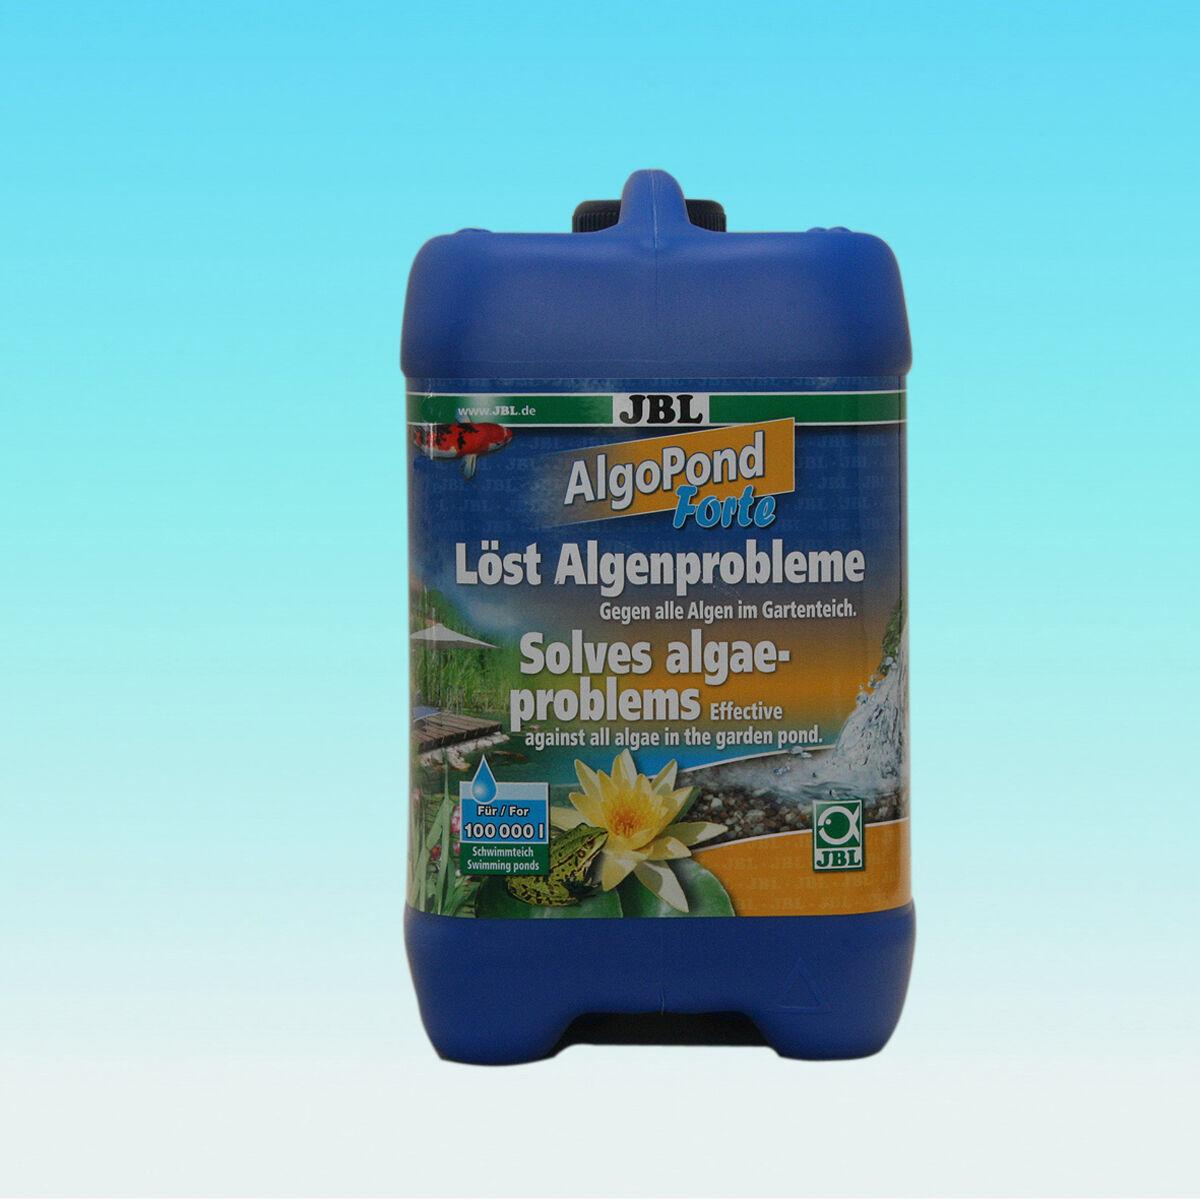 JBL algopond forte 5l-hilo algas algas creció algas fondos algas algas de estanque